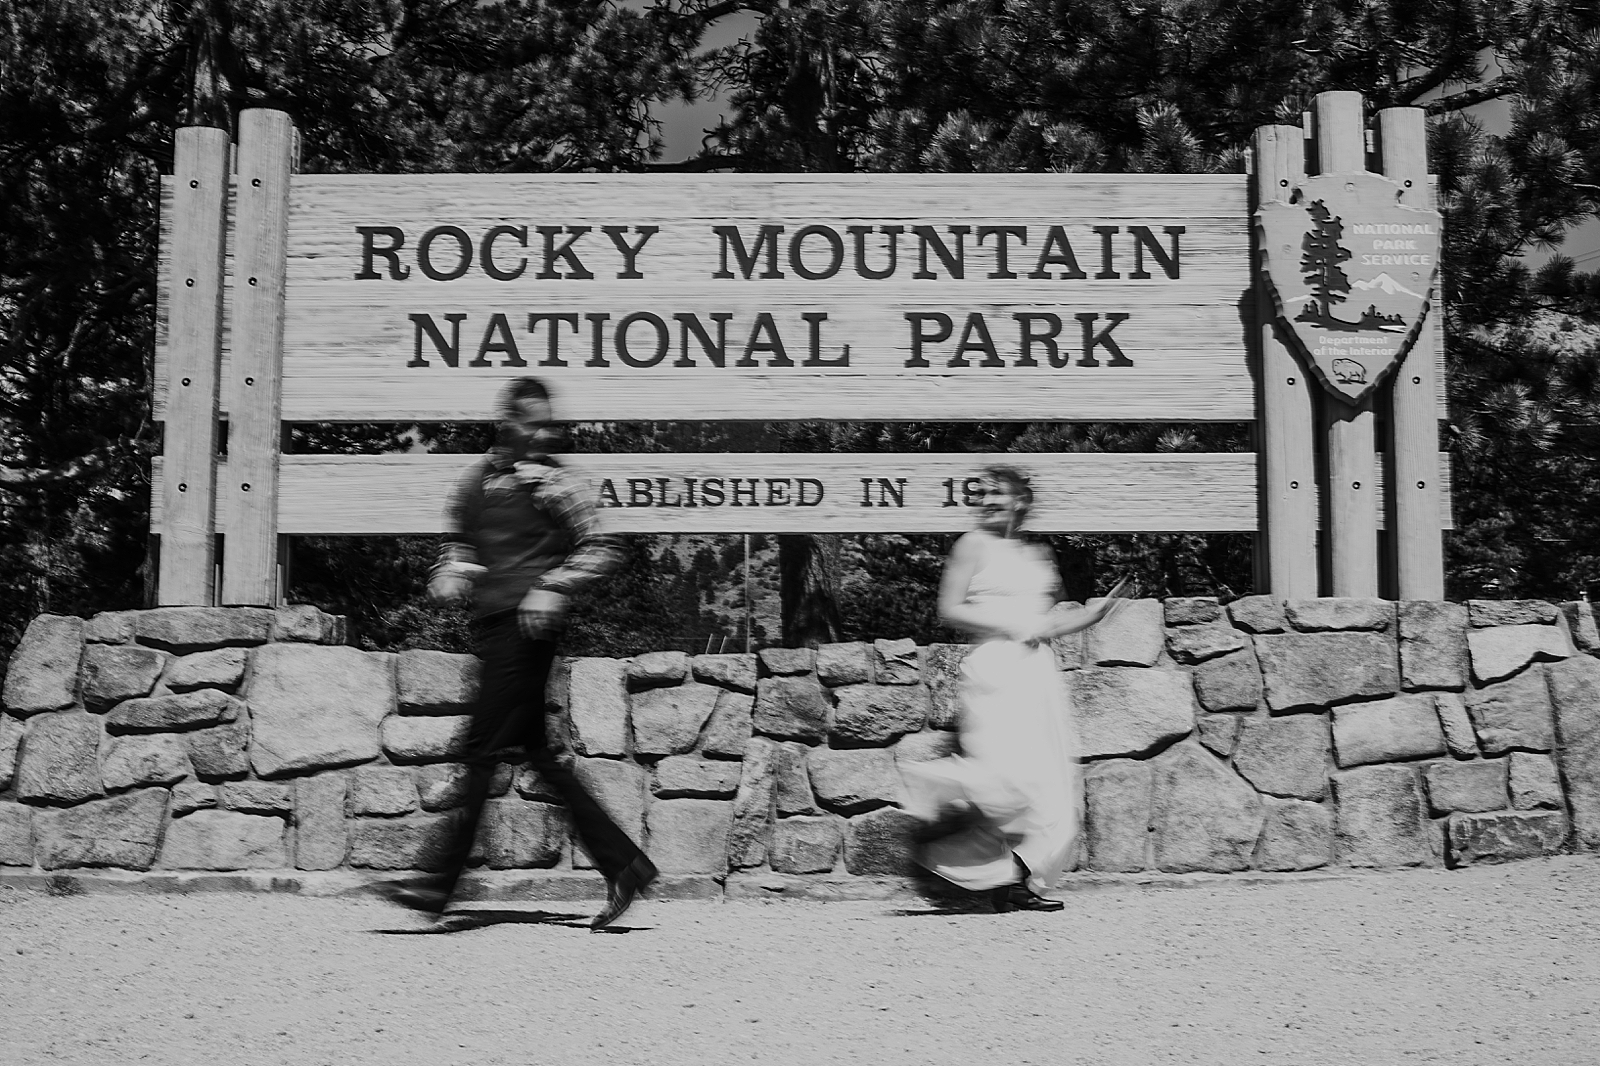 national park sign, RMNP elopement ceremony, rocky mountain national park elopement, 3M curves elopement, self solemnizing, self solemnization, long's peak, summer elopement, estes park elopement